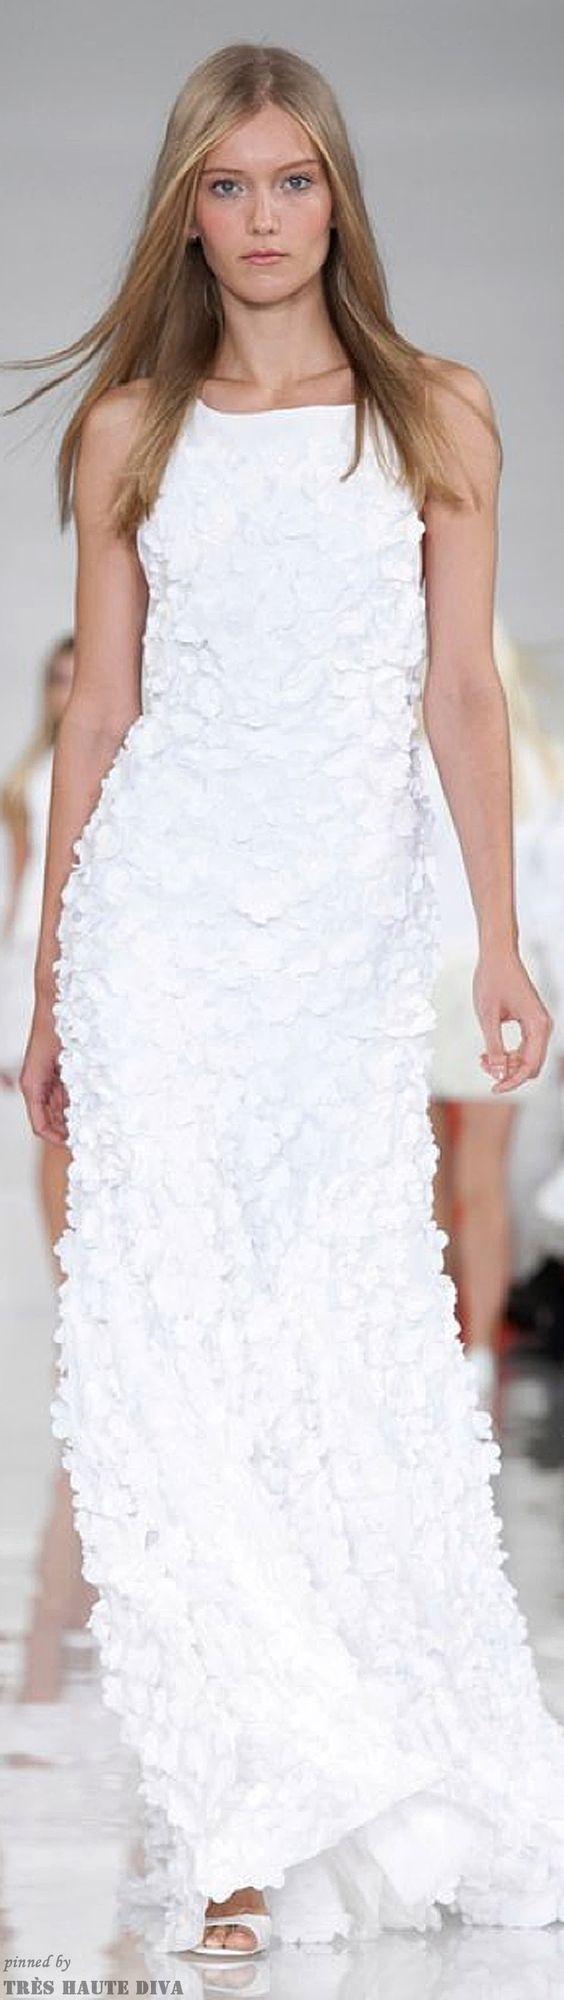 Wonderfully white.  Ralph Lauren 2014 - RTW www.nytimes.com. Via @swisschicboutiq.  #RalphLauren #gowns